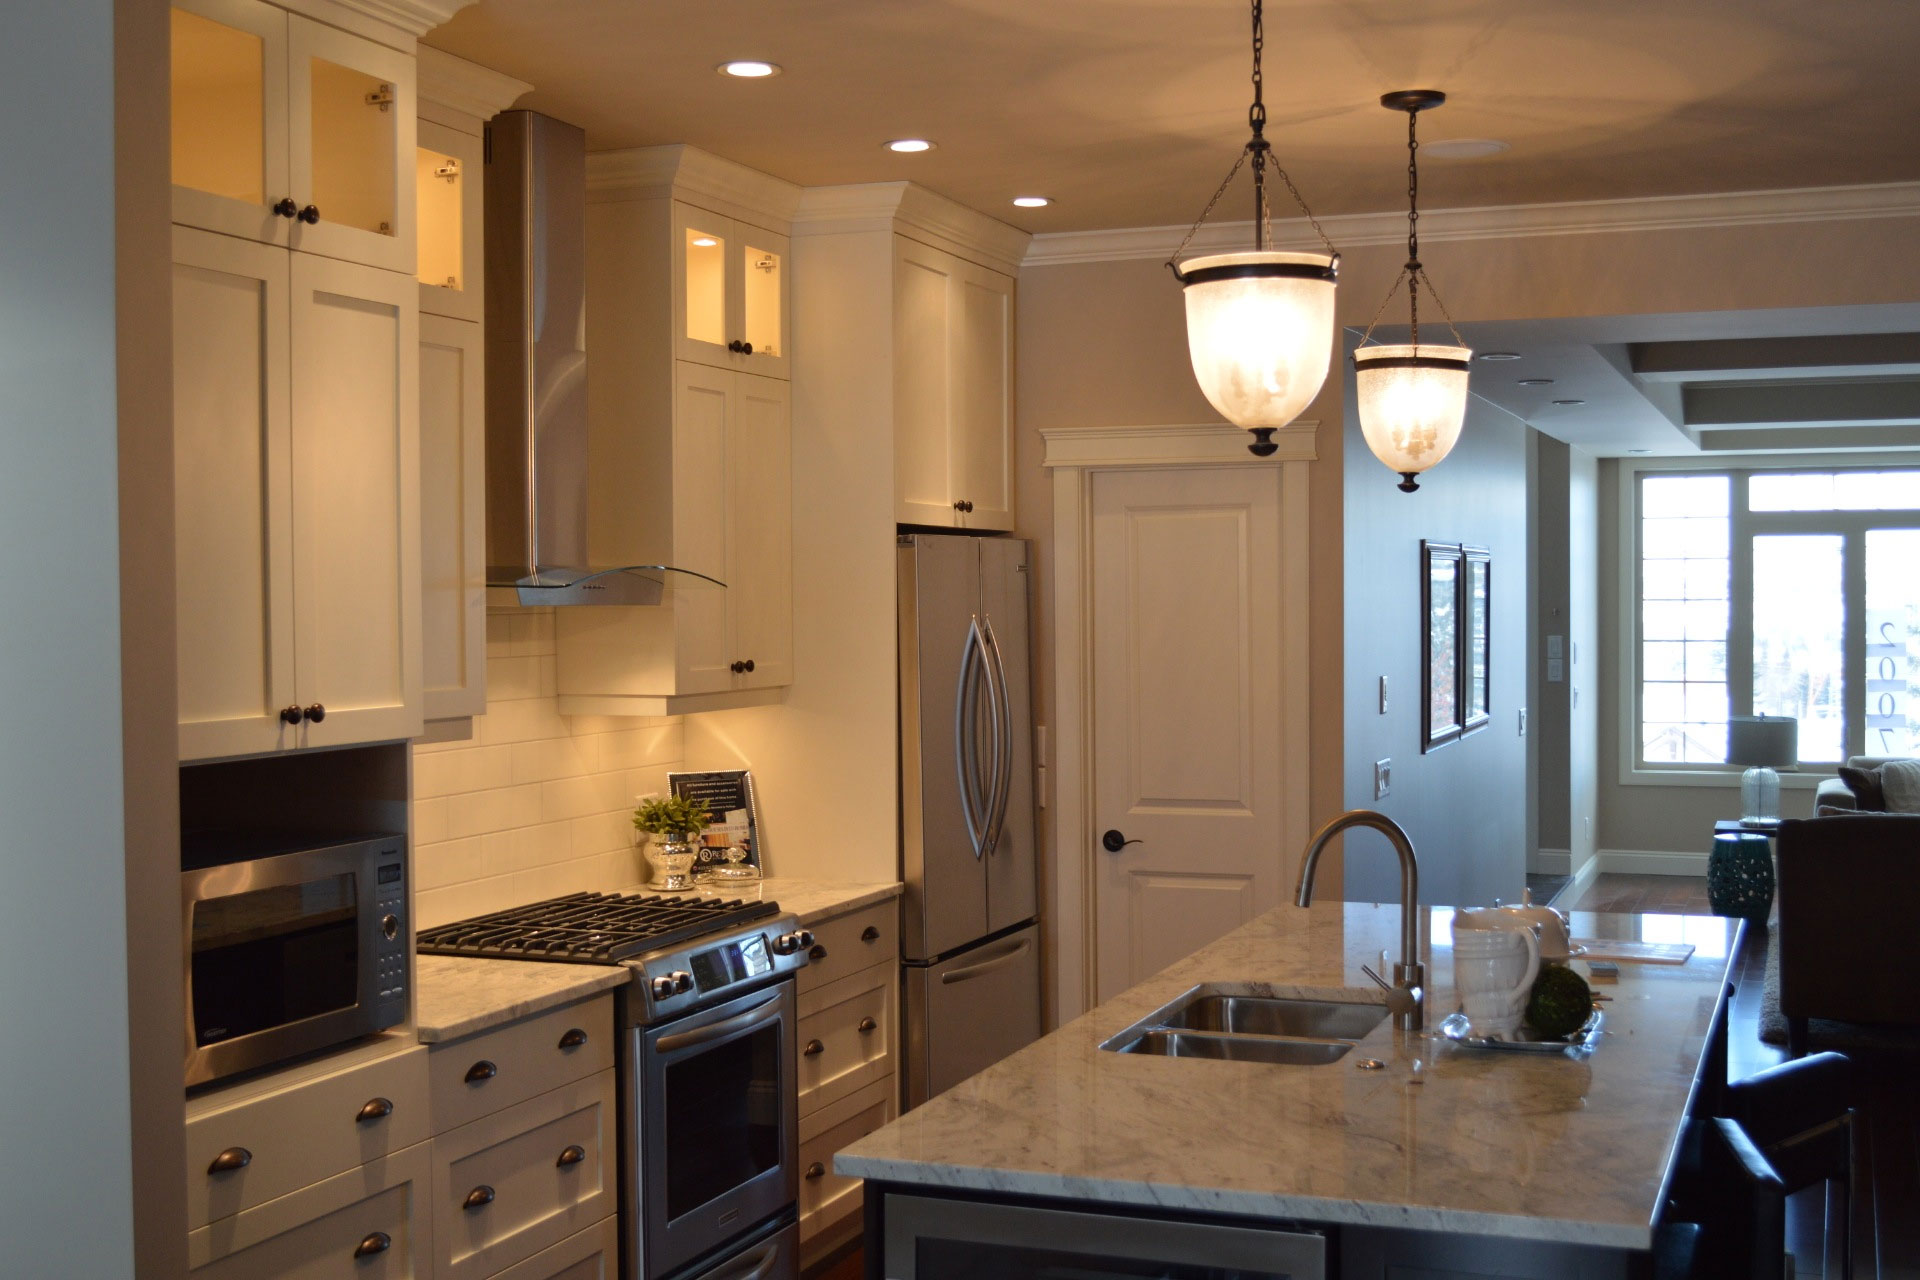 Duplex Kitchen Remodel by Style Developments in Calgary Alberta